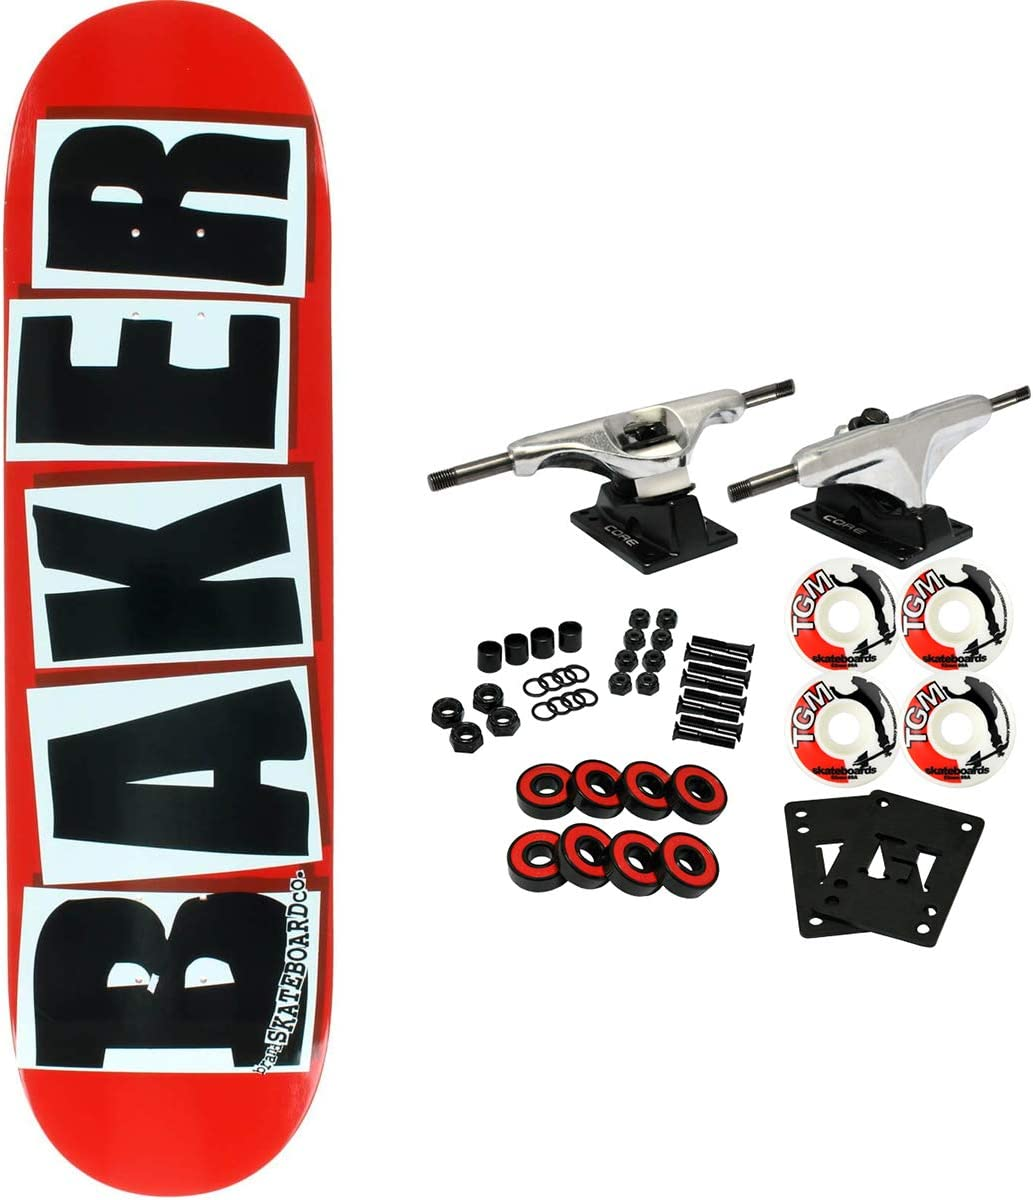 Baker Skateboard Max 78% OFF Complete Brand 8.38